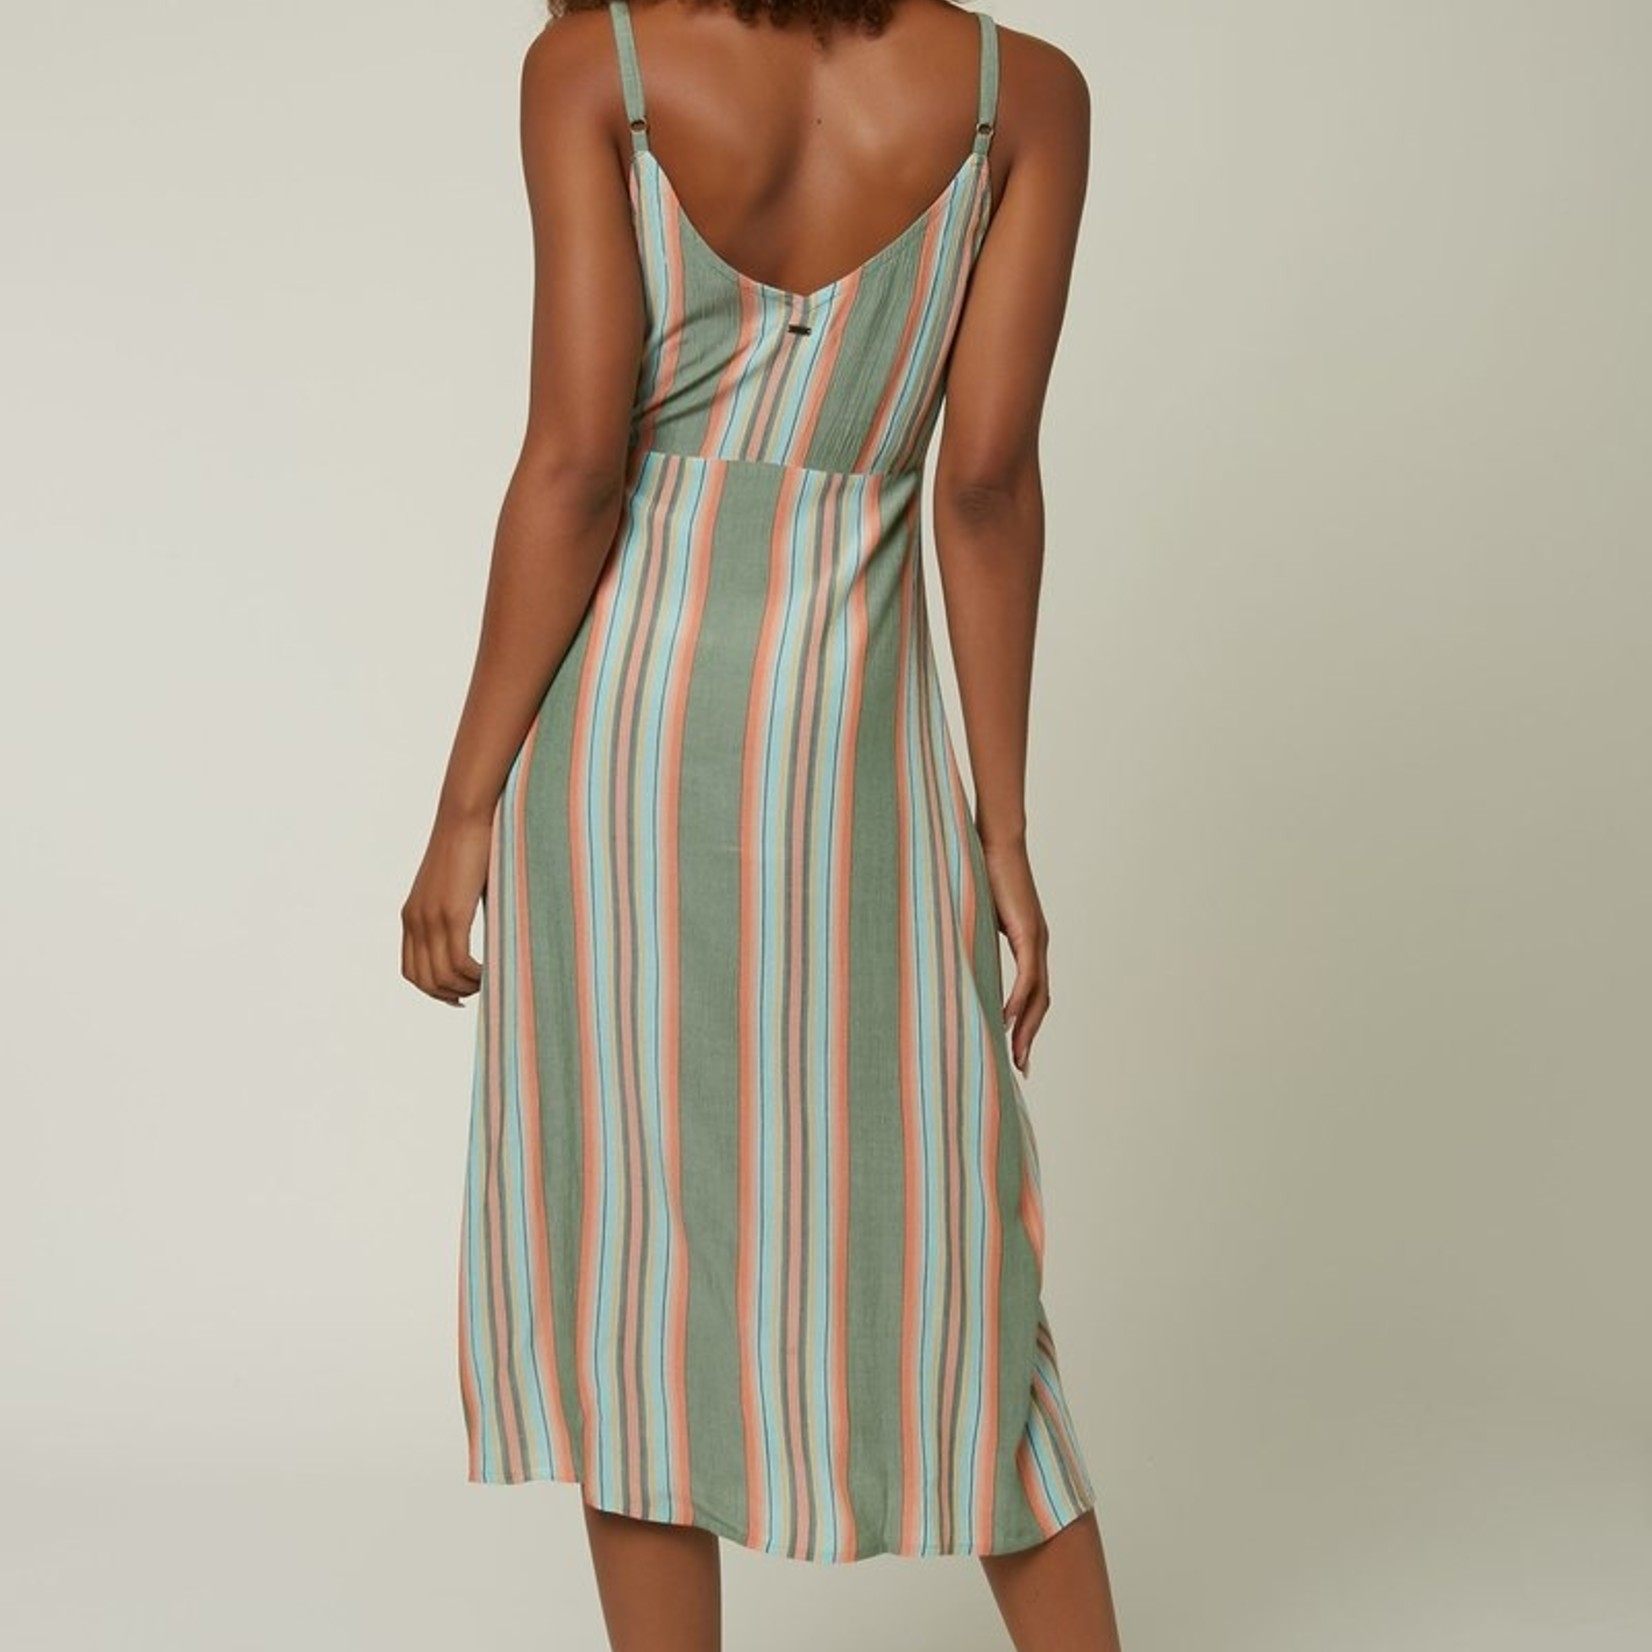 O'Neill O'Neill Sloan Dress